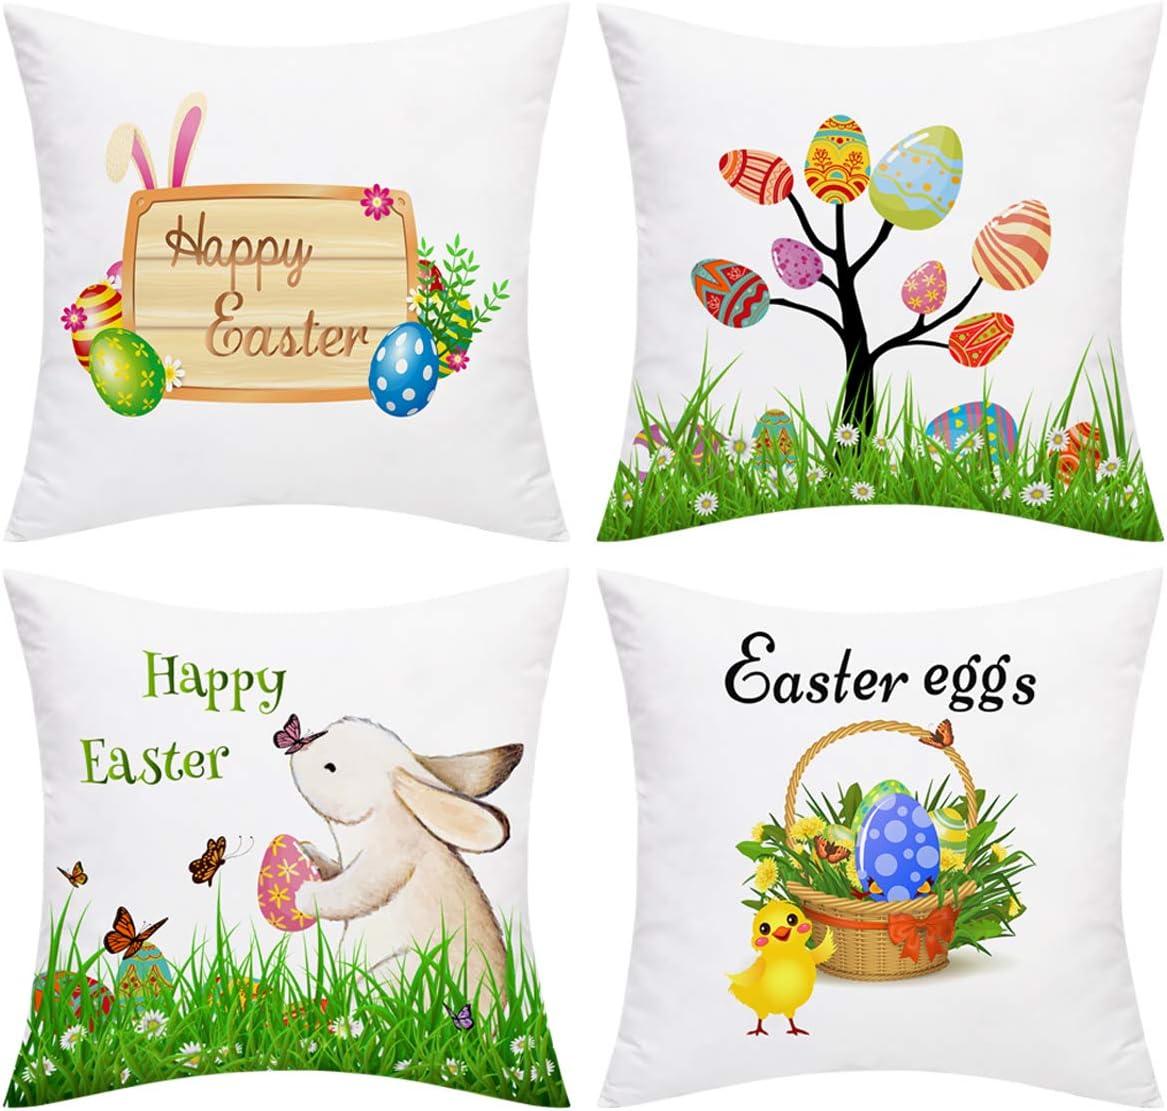 BLEUM CADE discount Happy Regular store Easter Throw Ca Eggs Pillow Cover